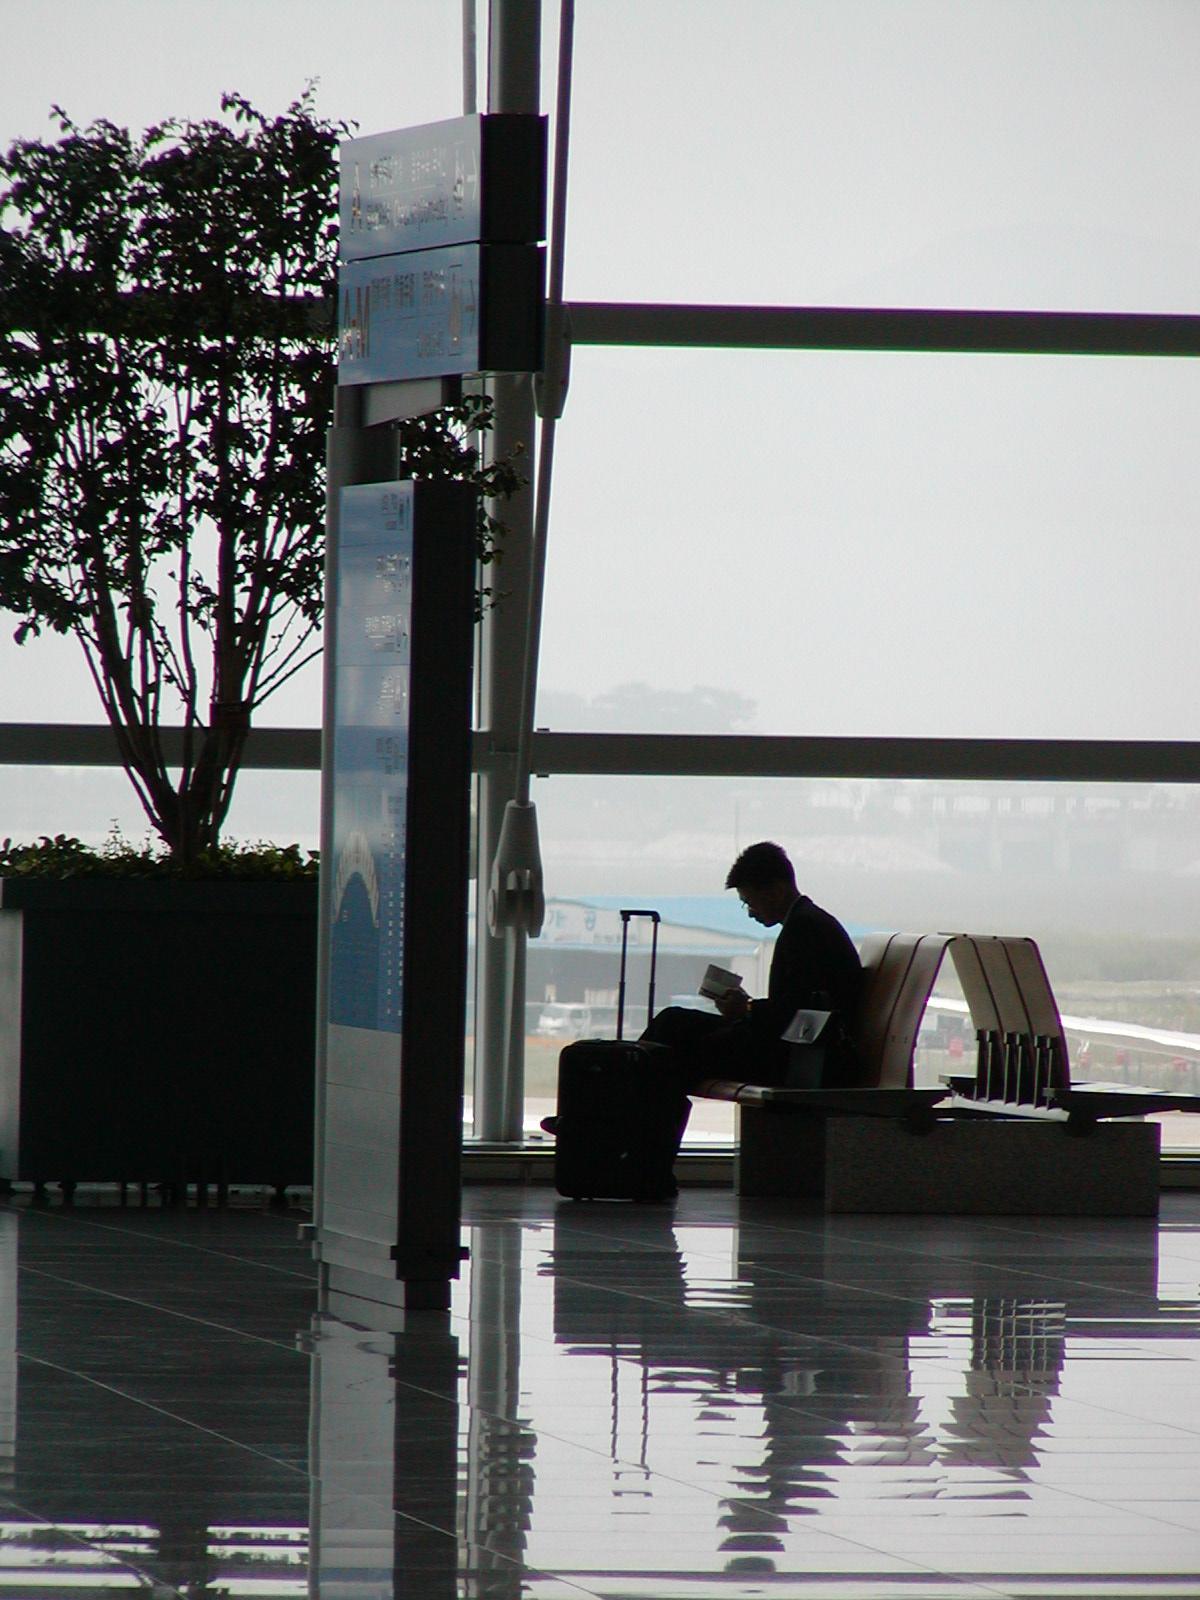 A man waiting in an aiport.